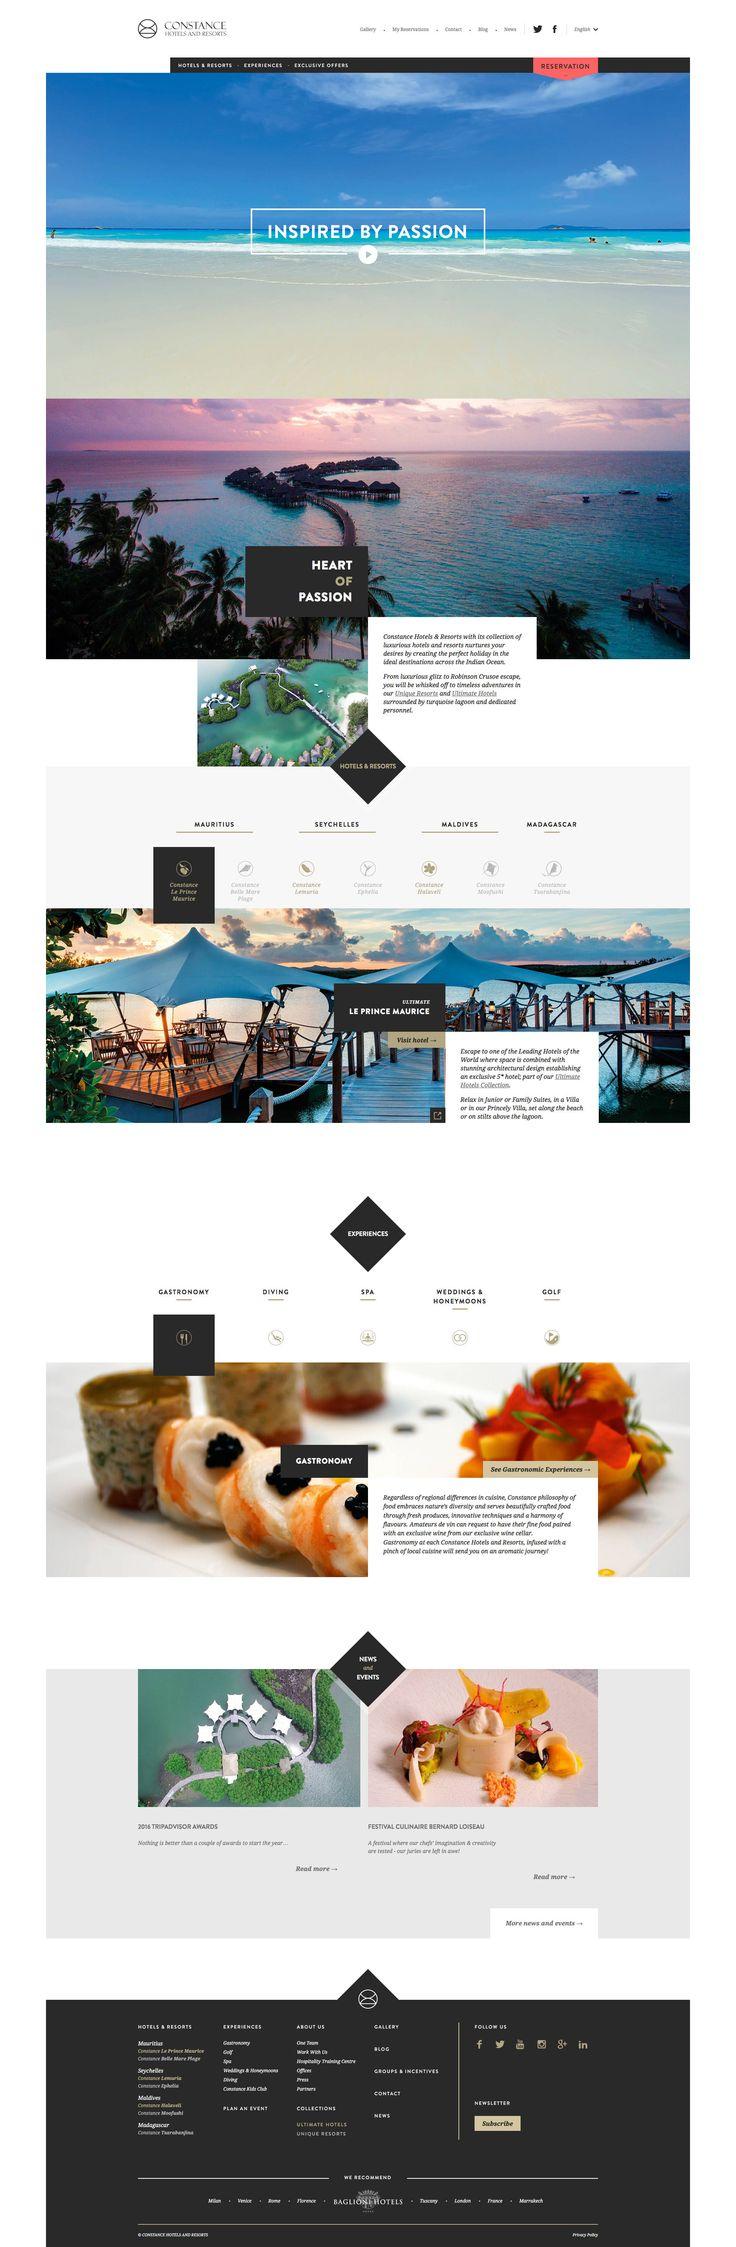 Constance Hotels & Resorts #webdesign #hotels #resorts #holidays #maldives…